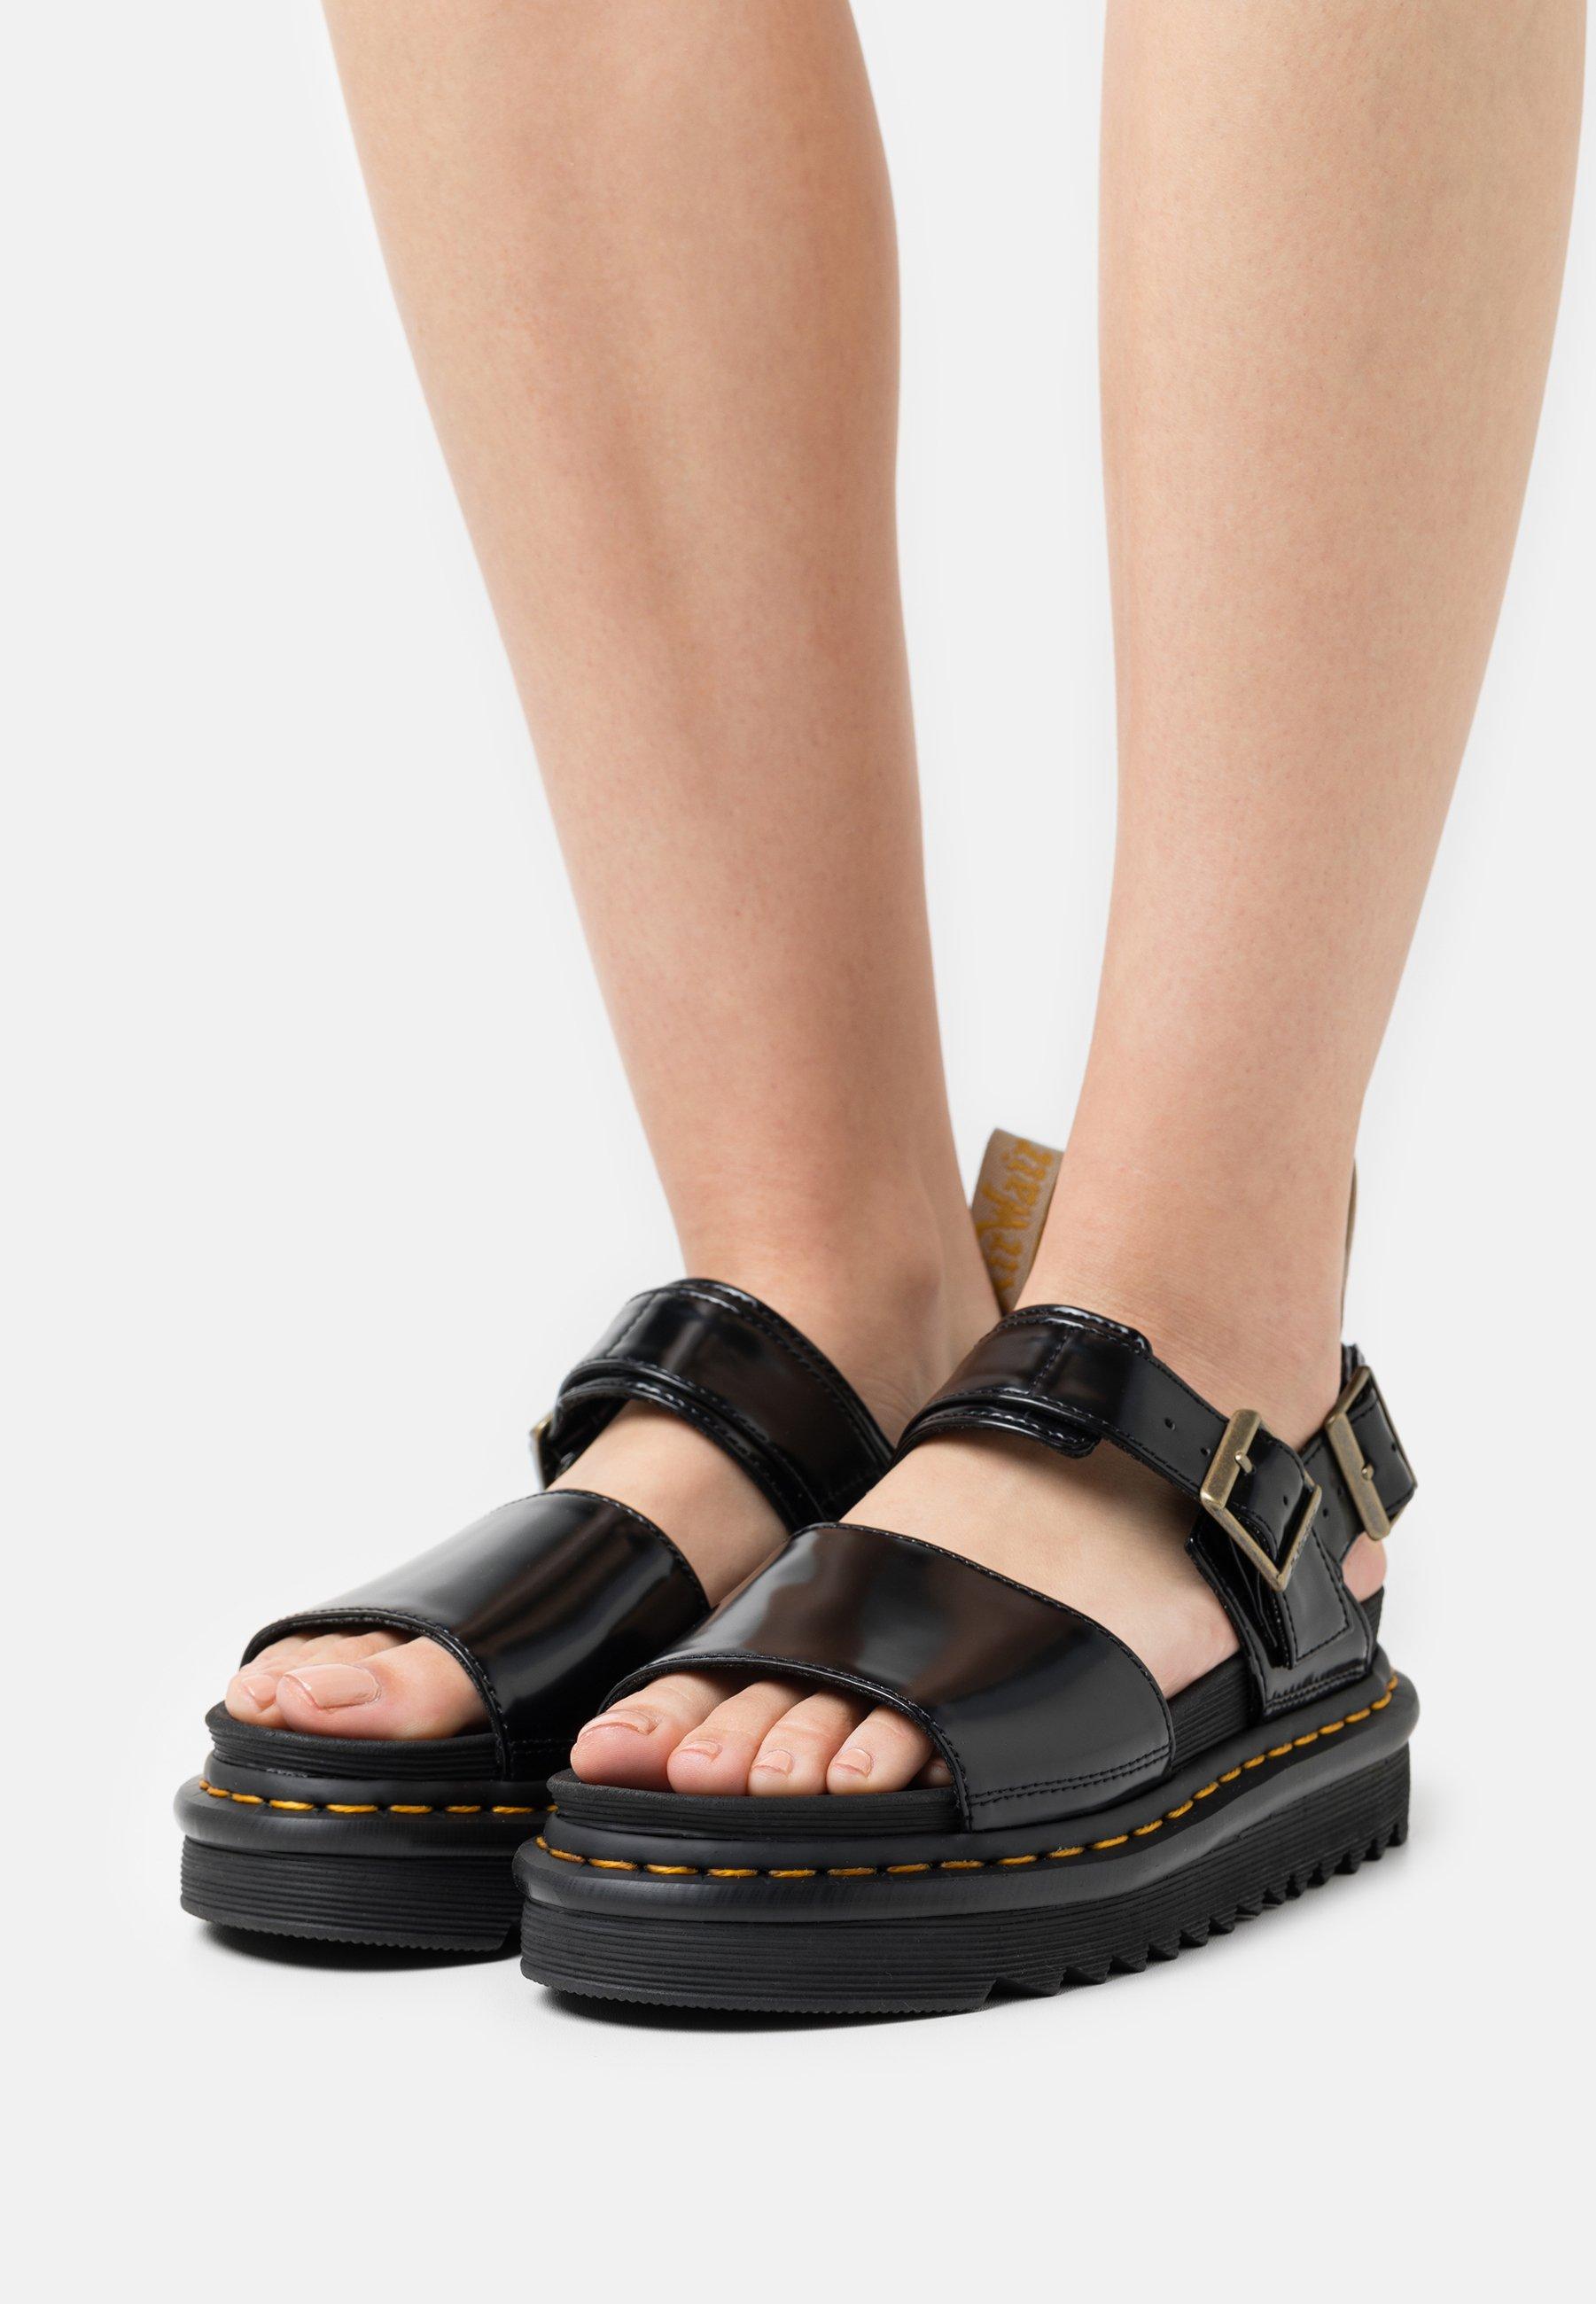 Women VEGAN VOSS - Platform sandals - black